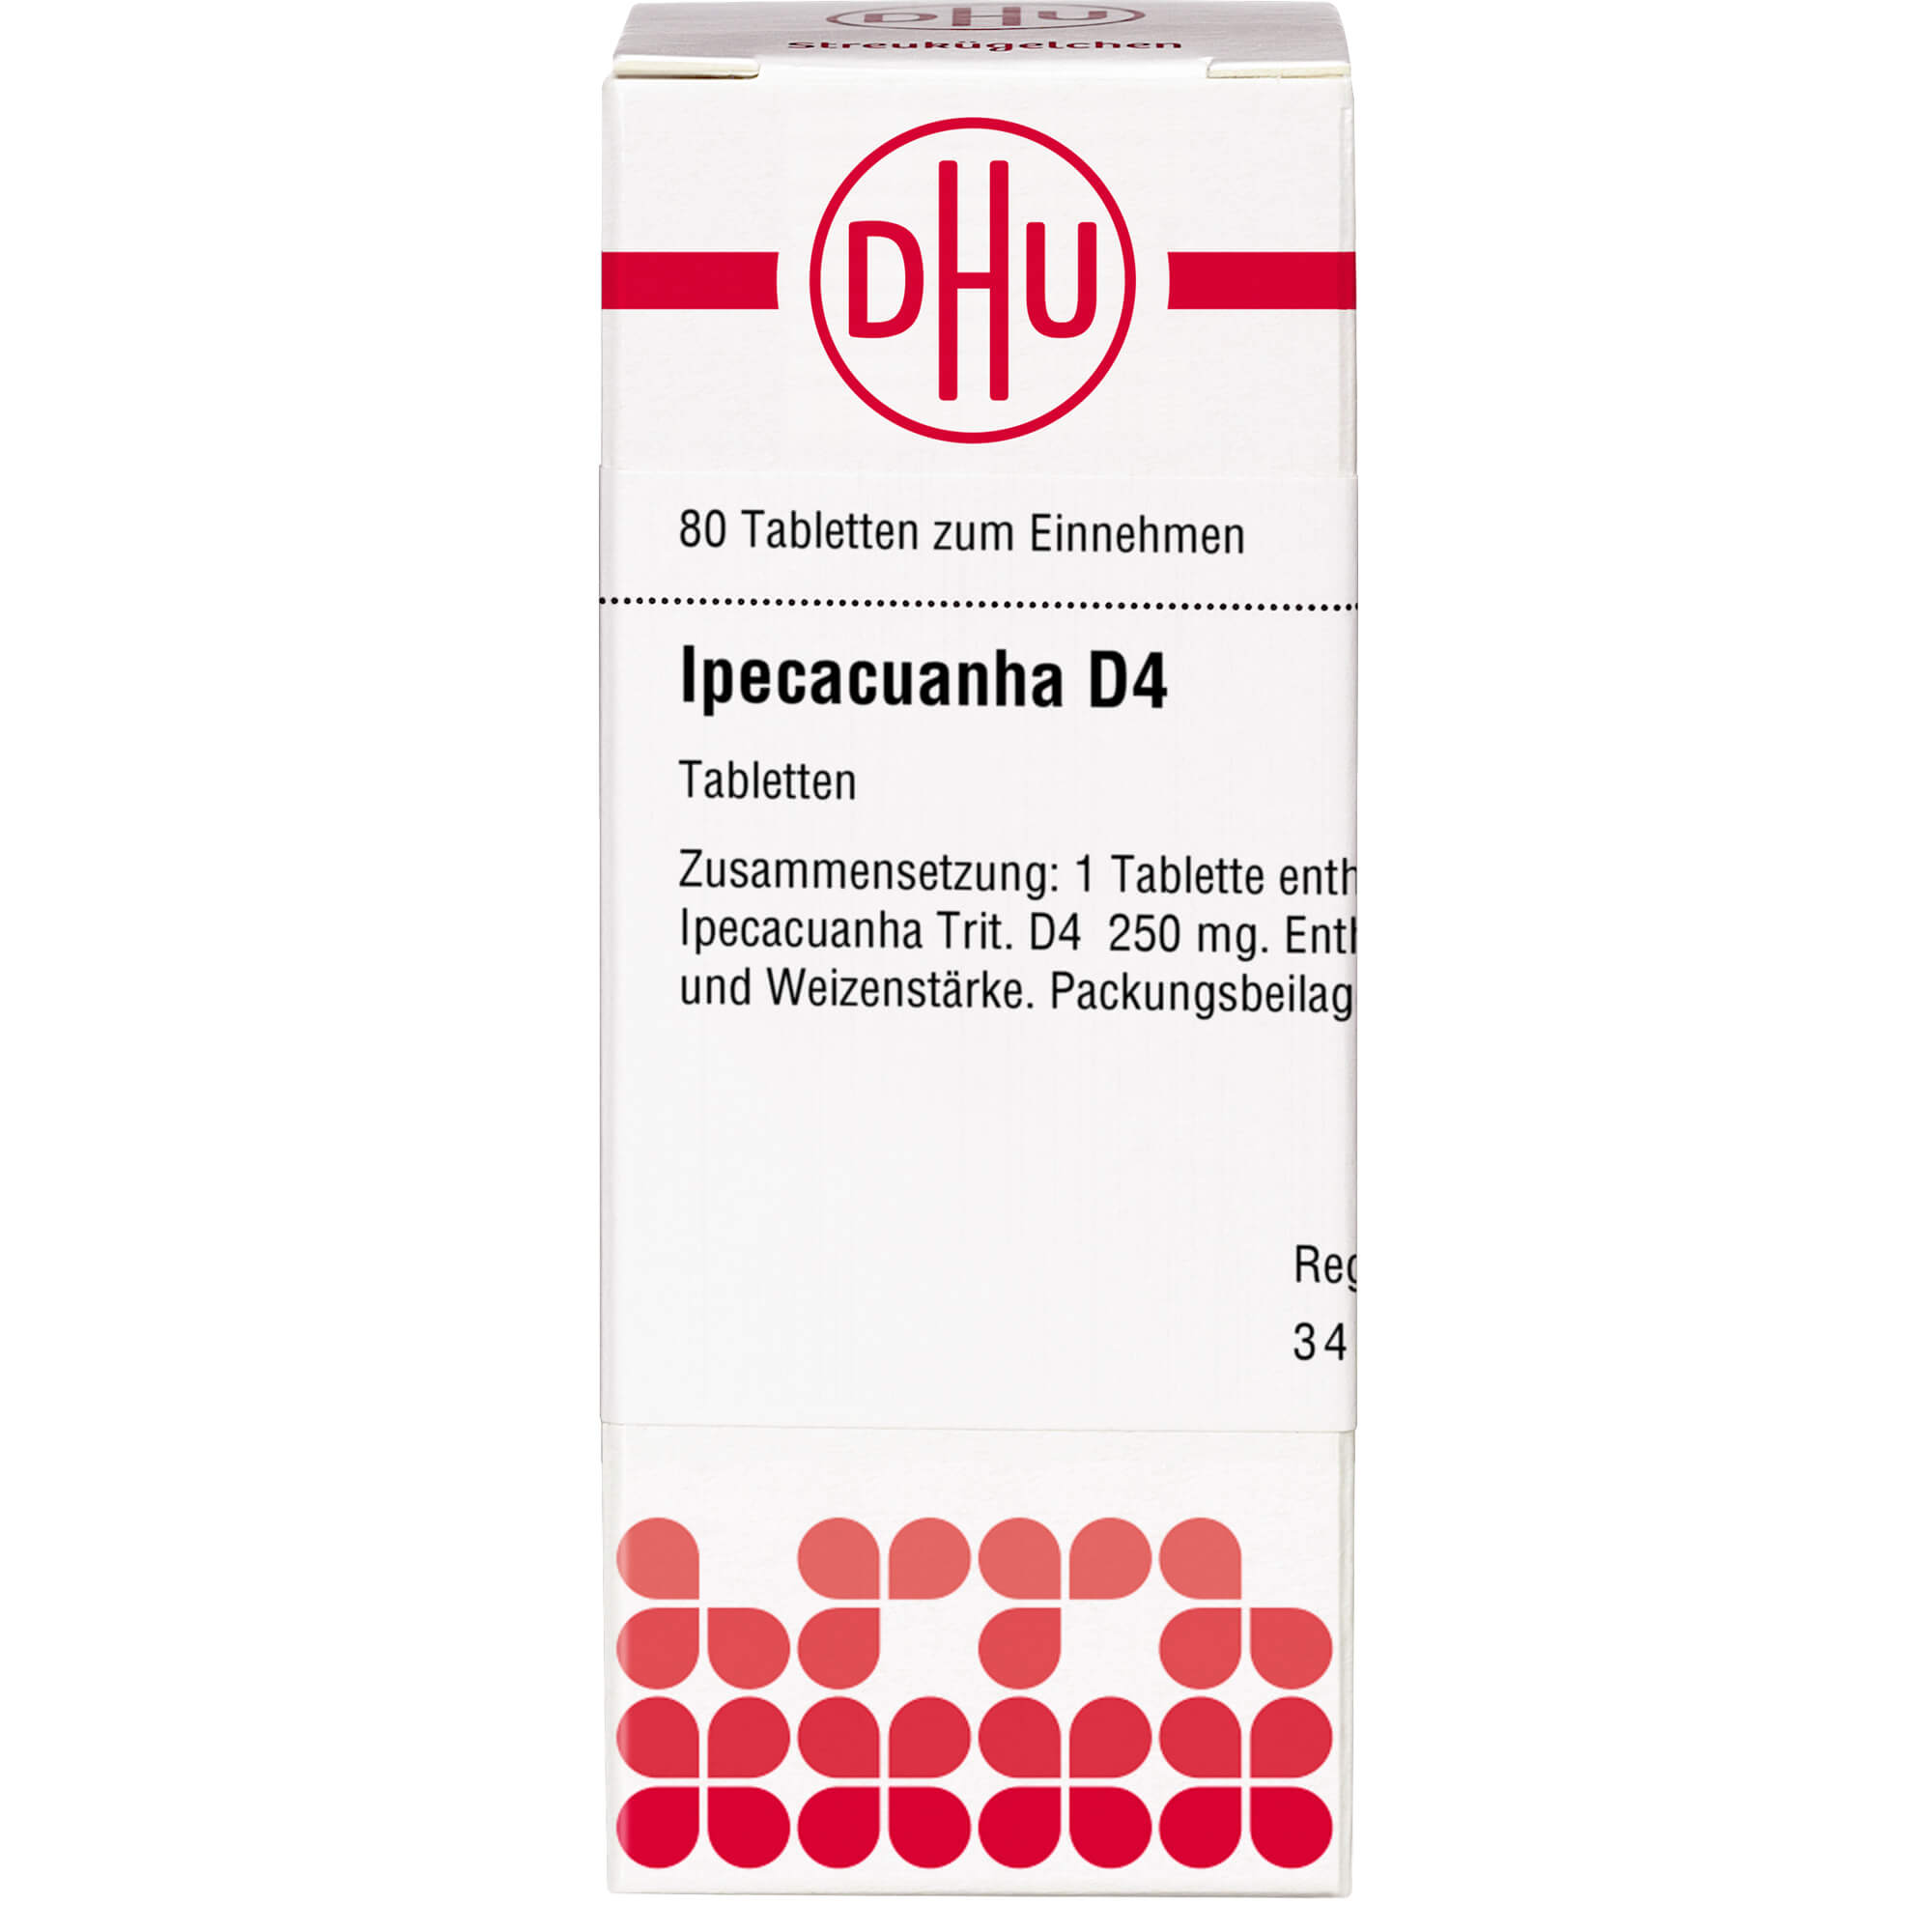 IPECACUANHA D 4 Tabletten